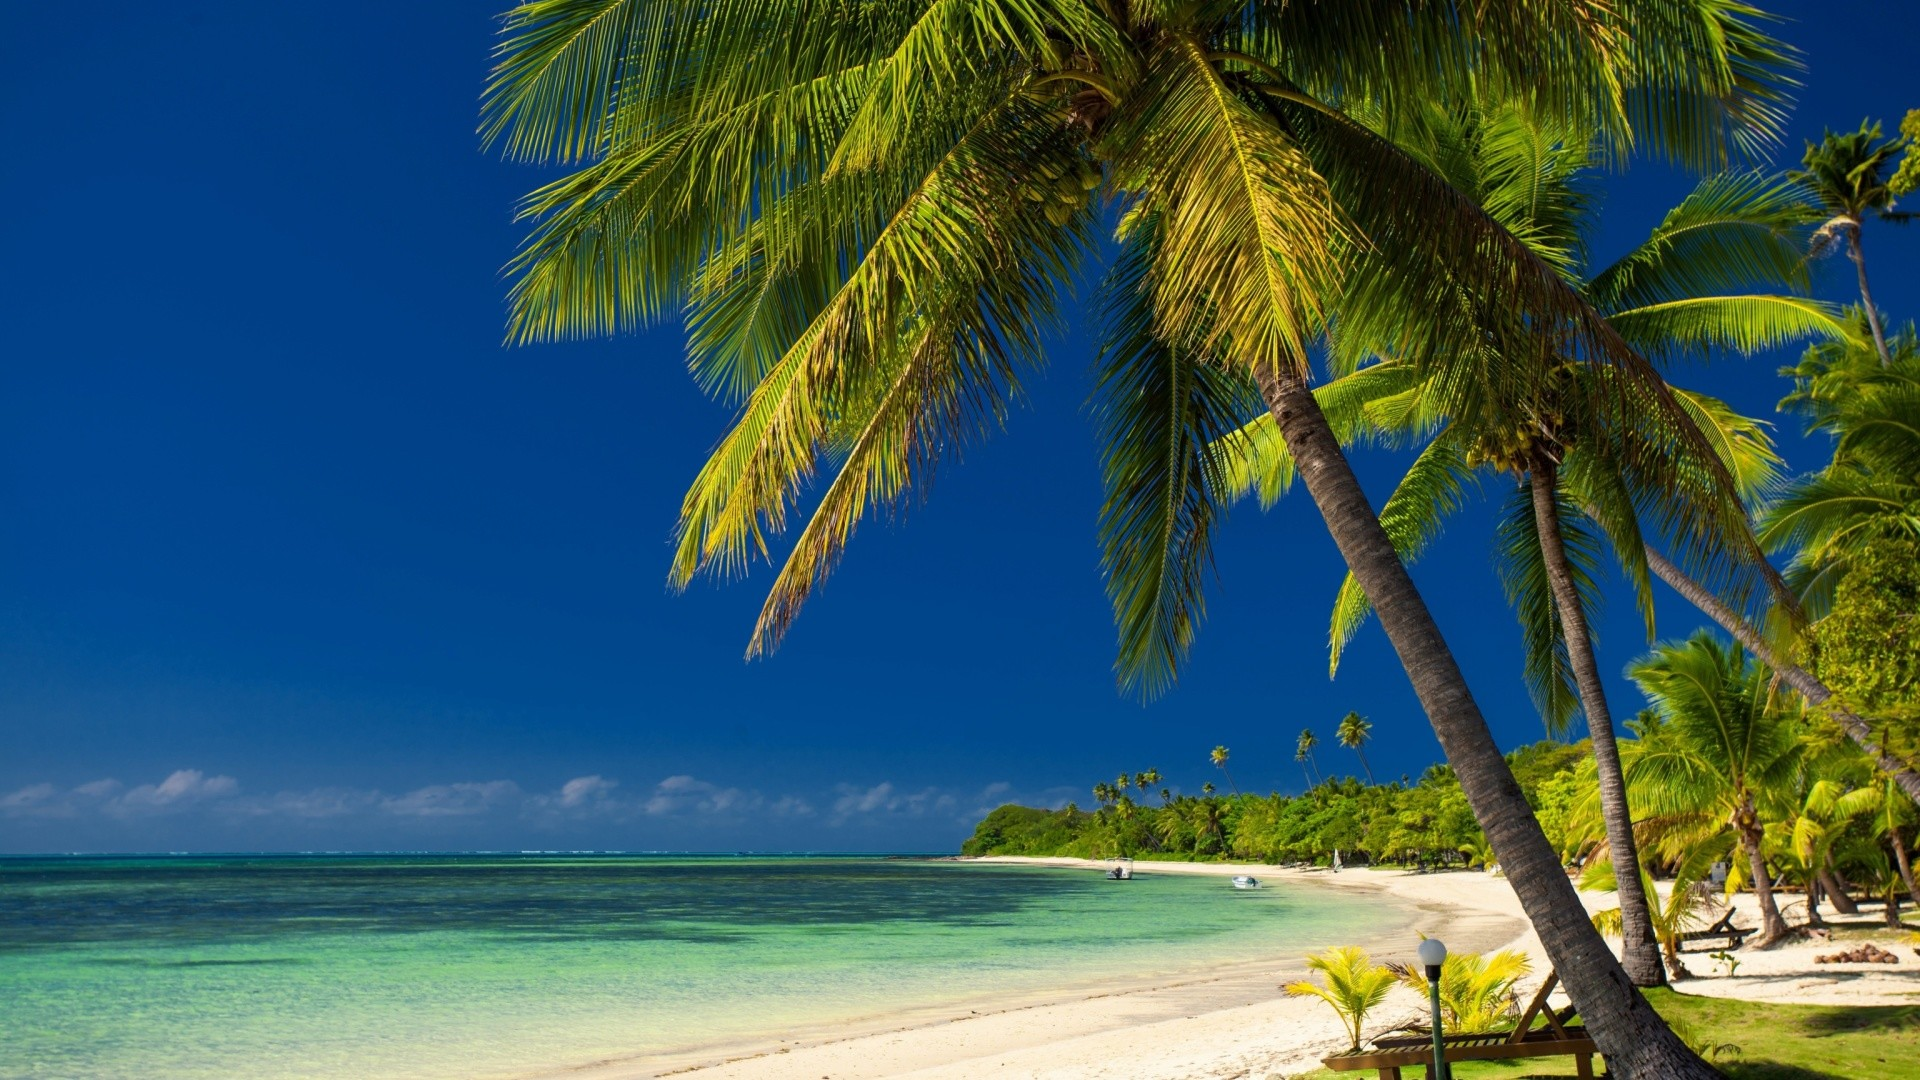 Filename: Paradise-Coast-Dominican-Republic-in-Summer-Background-Wallpaper- HD.jpg